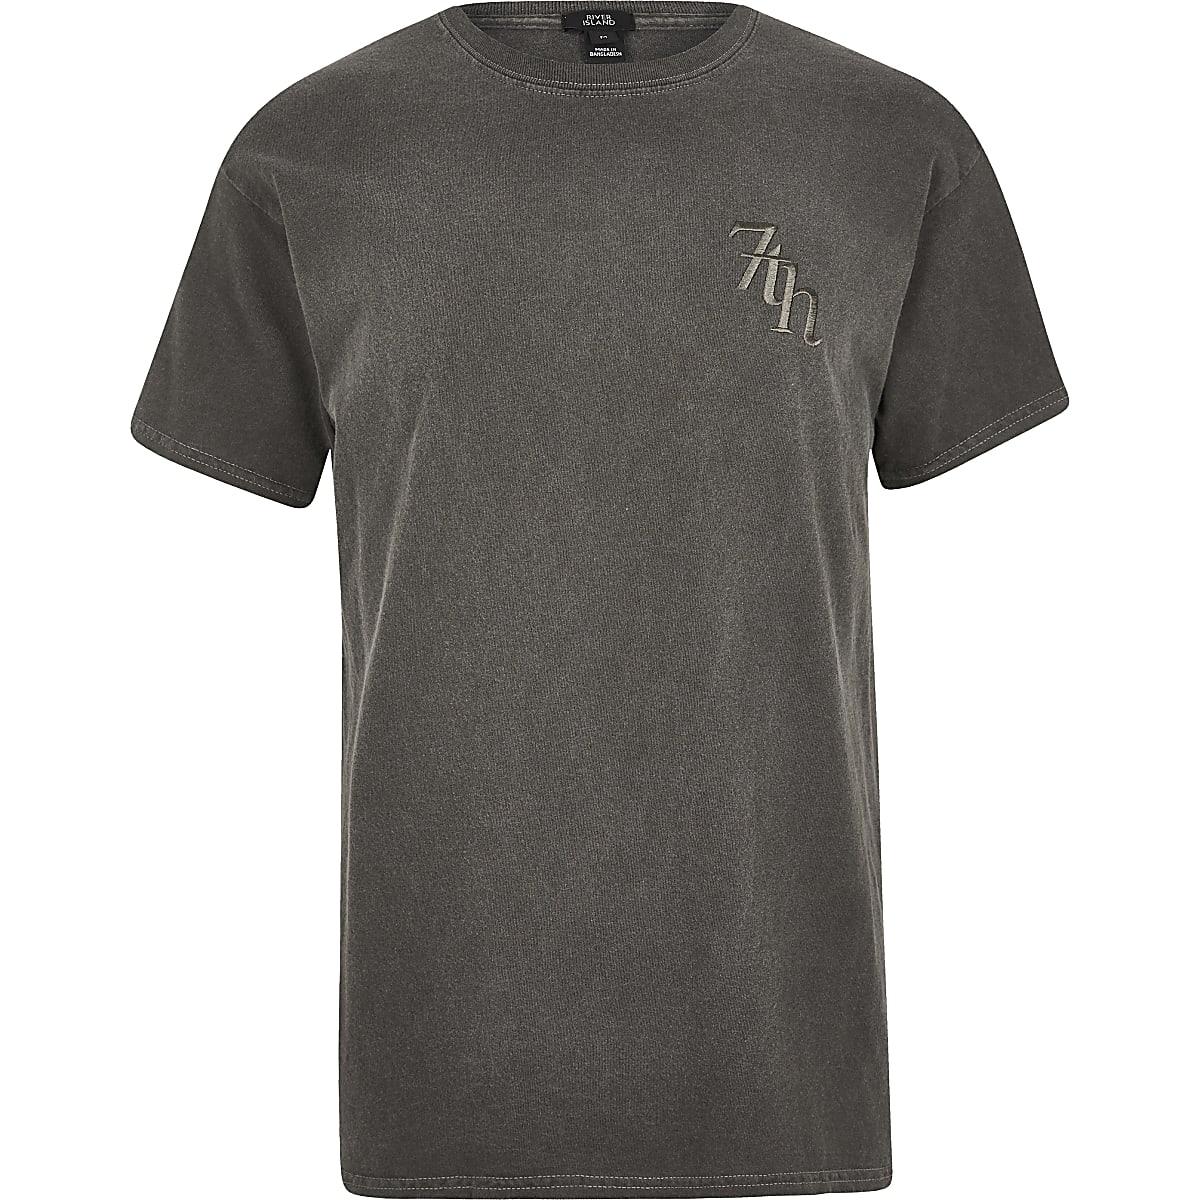 Black washed 'Svnth' embroidered T-shirt